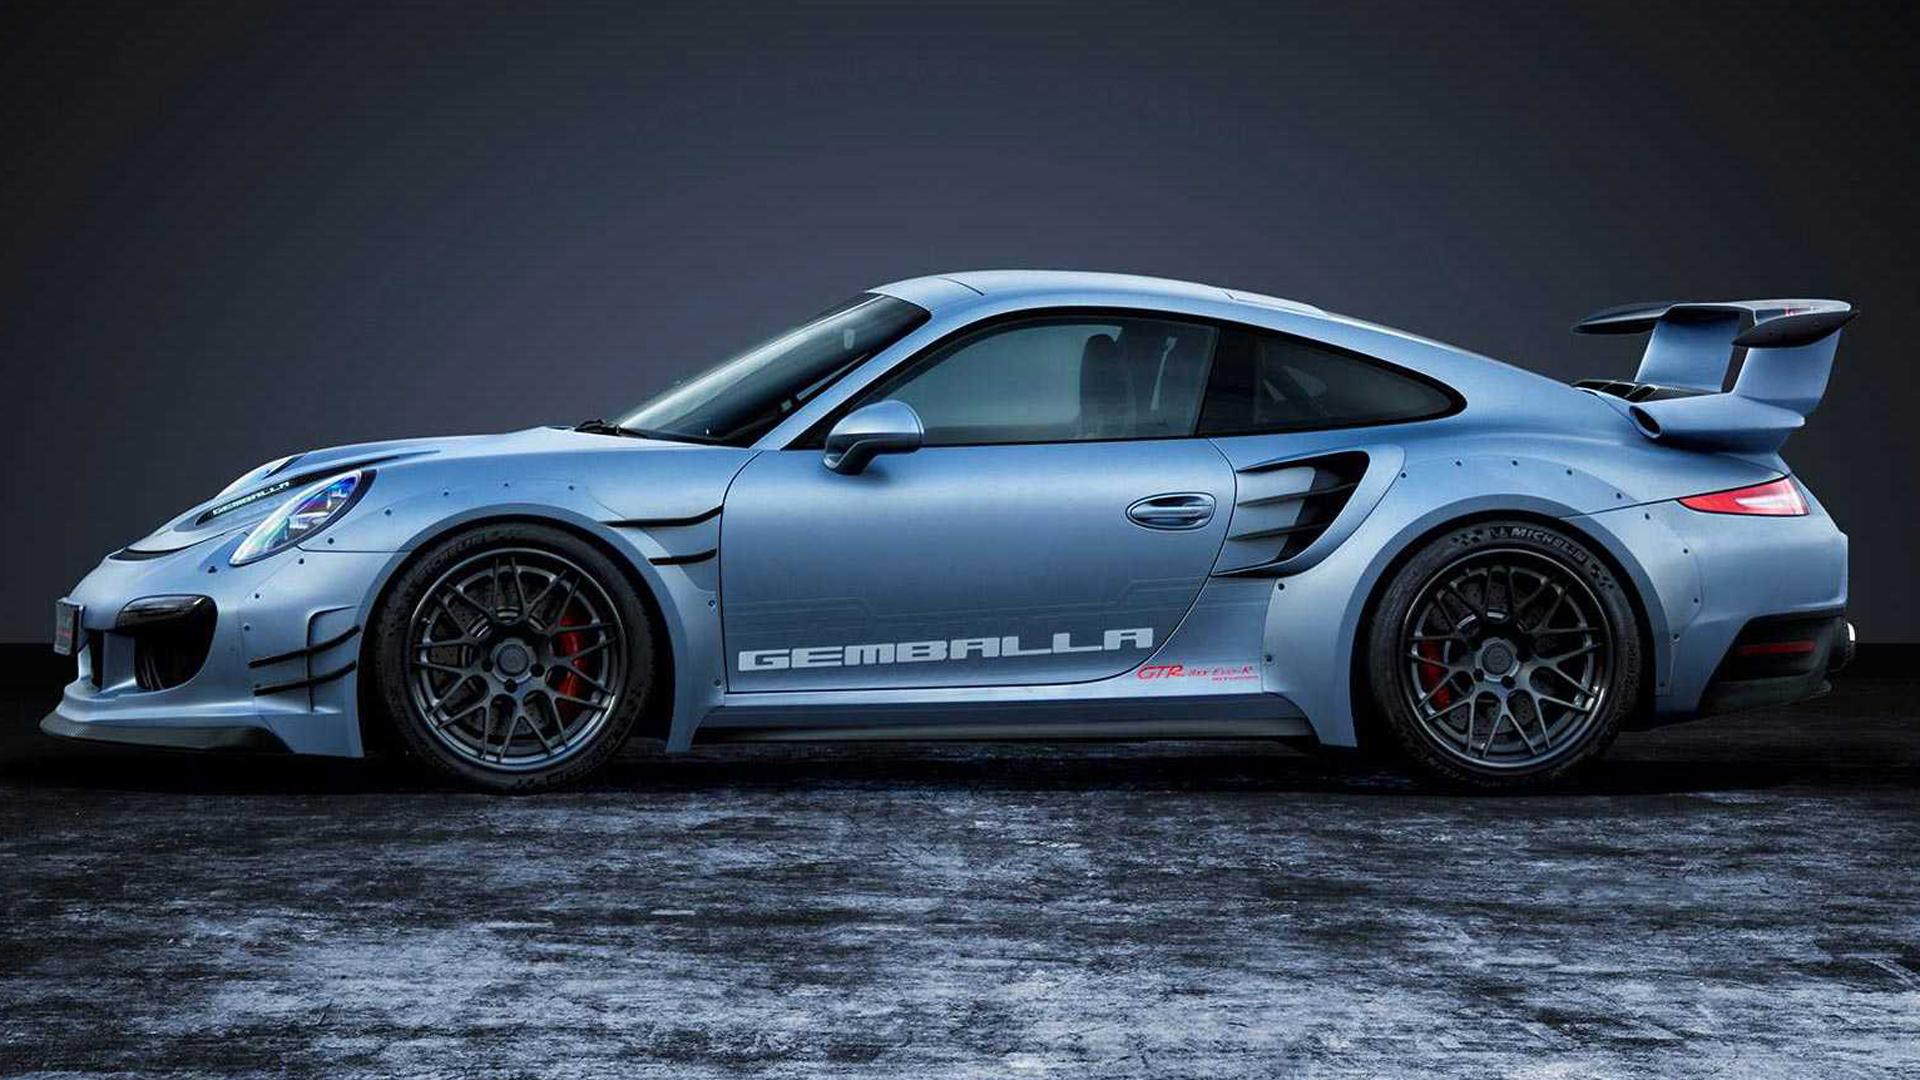 Porsche 911 Turbo by Gemballa GTR-8XX EVO-R